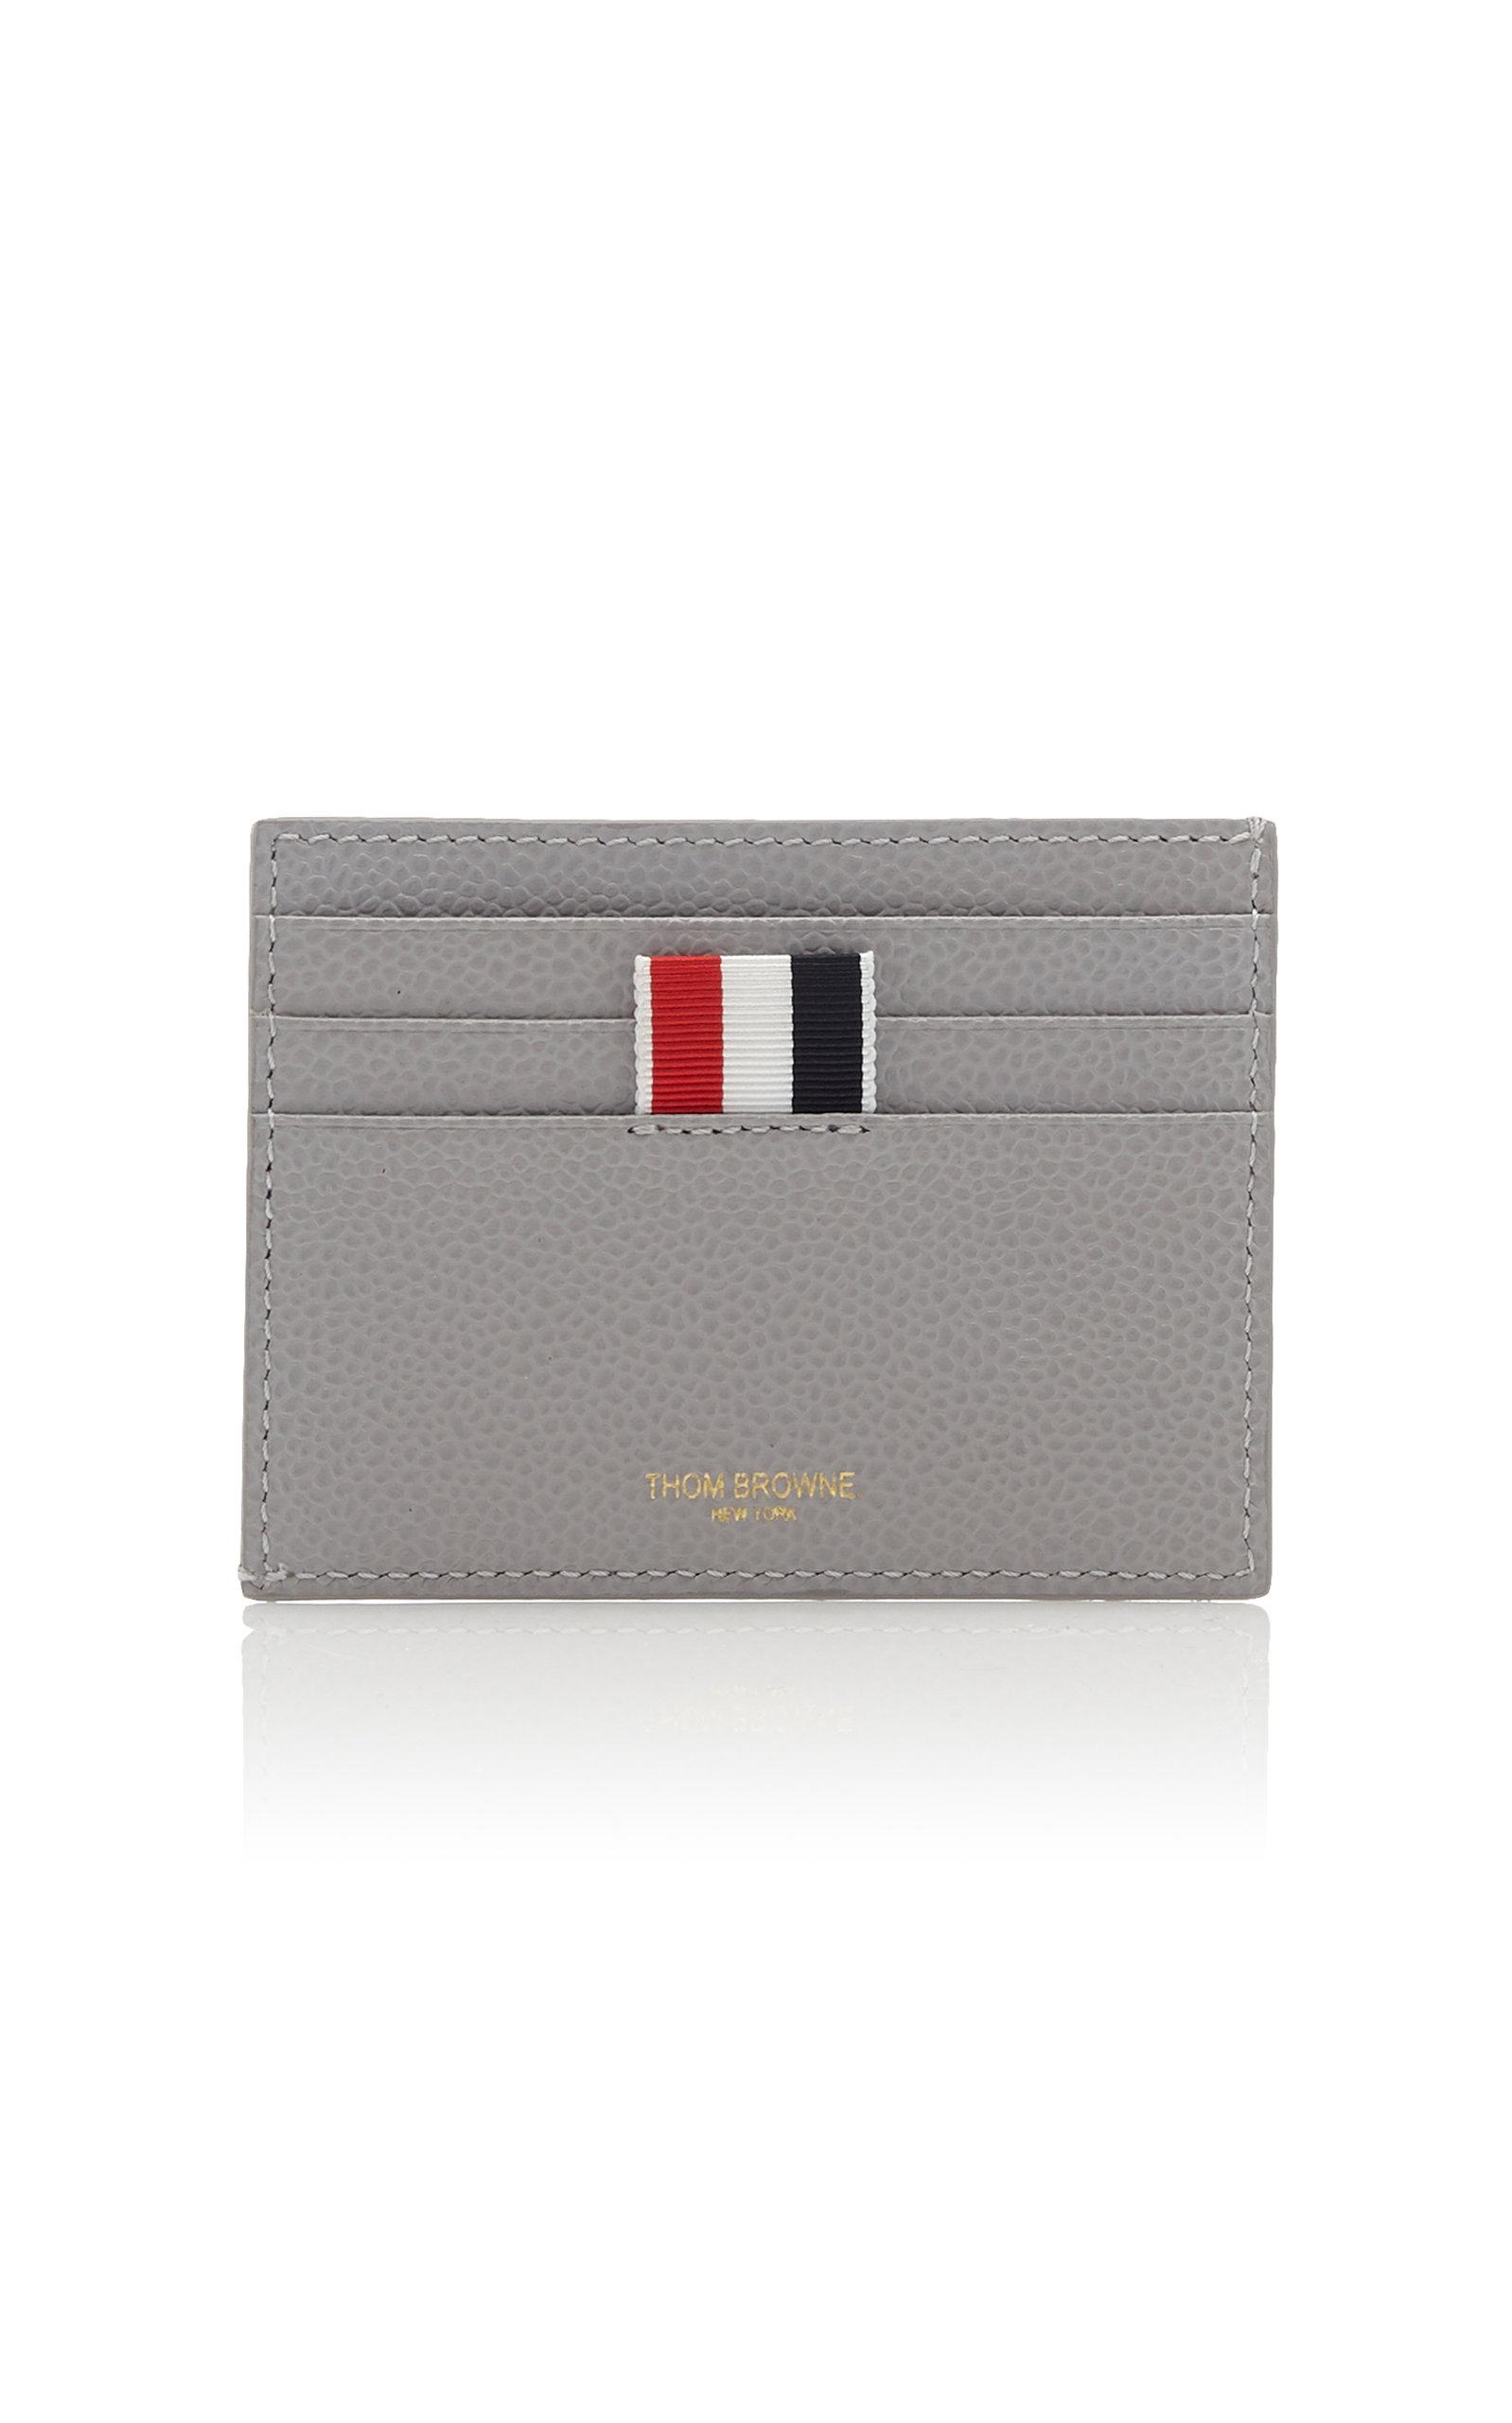 9e0fae50dc Thom BrownePebble-Grain Leather Cardholder. CLOSE. Loading. Loading